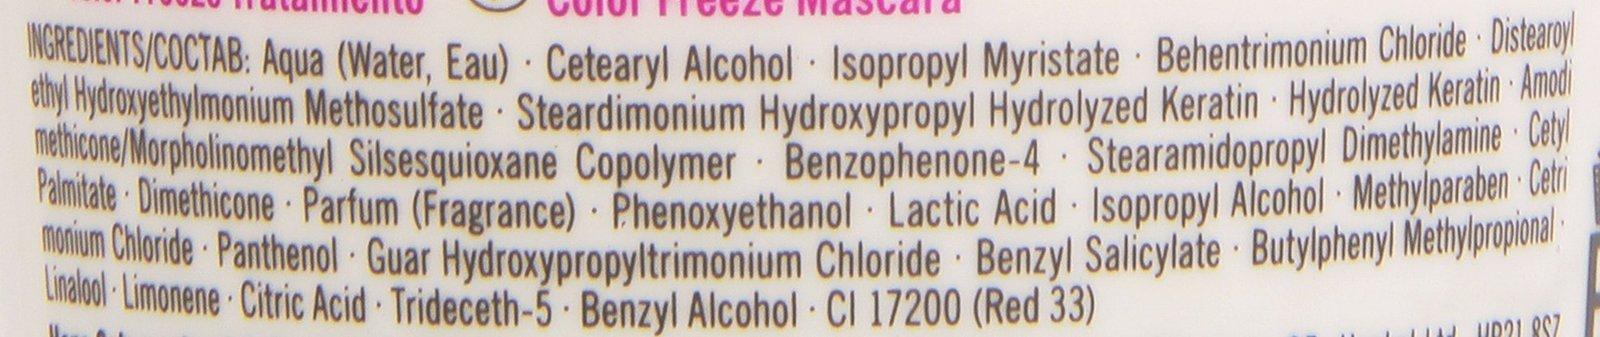 BC COLOR FREEZE treatment 200 ml